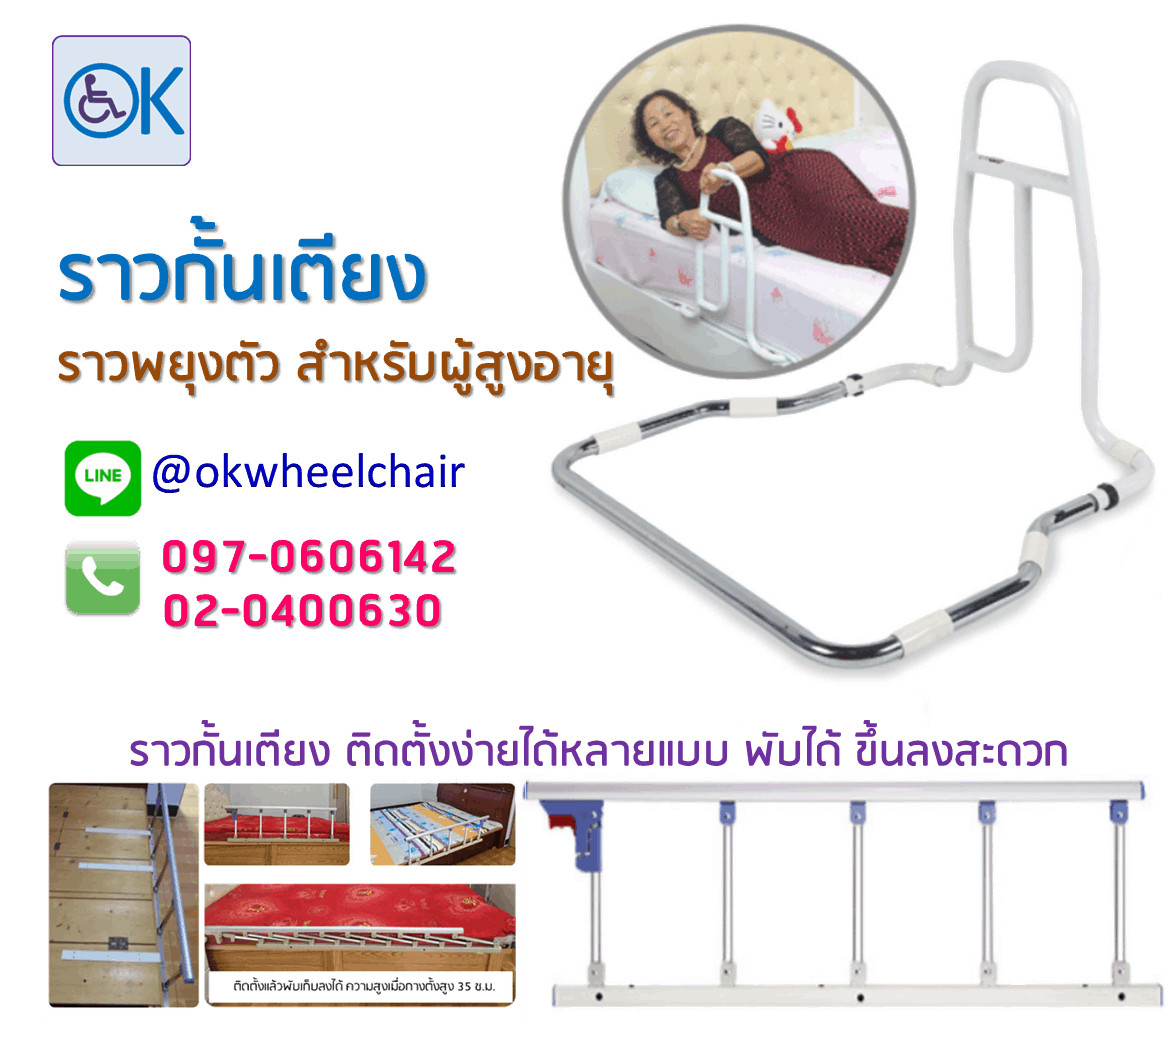 okwheelchair -ราวกั้นเตียง